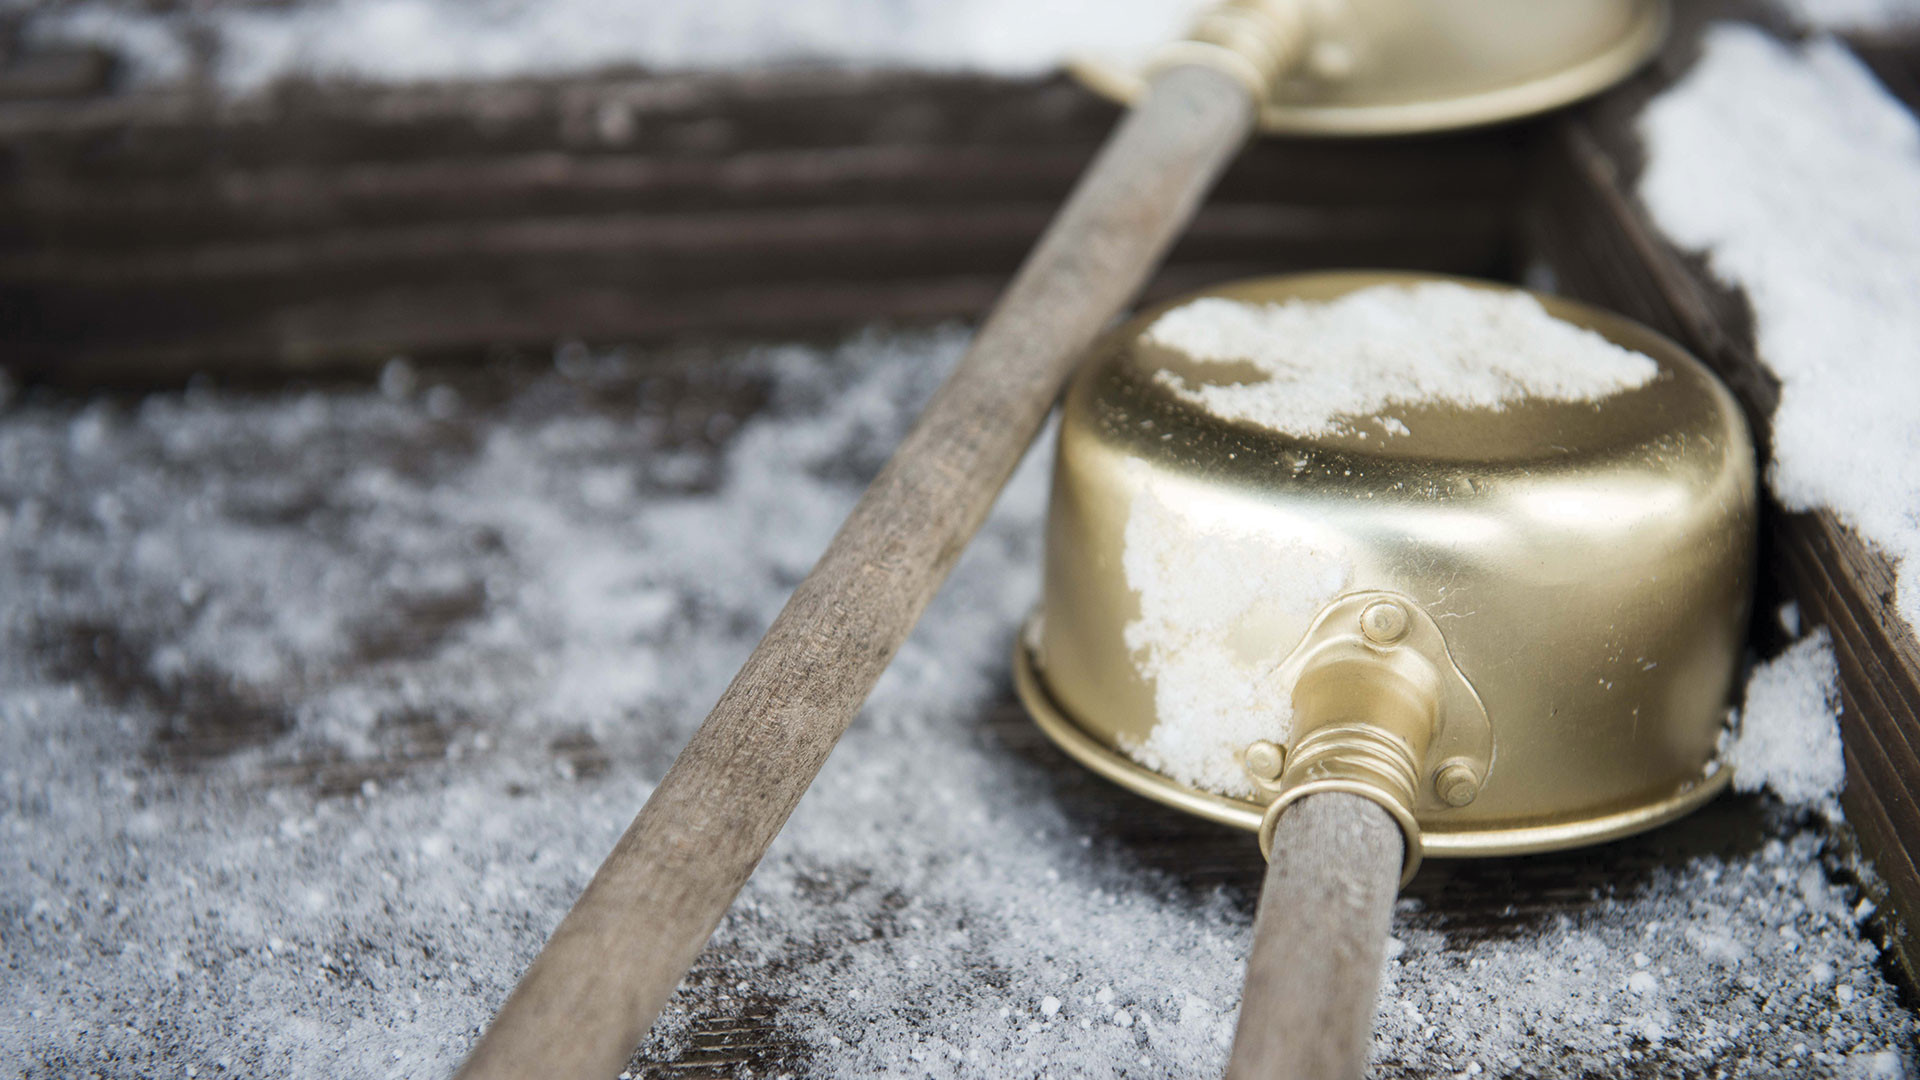 Sake-tasting ladles